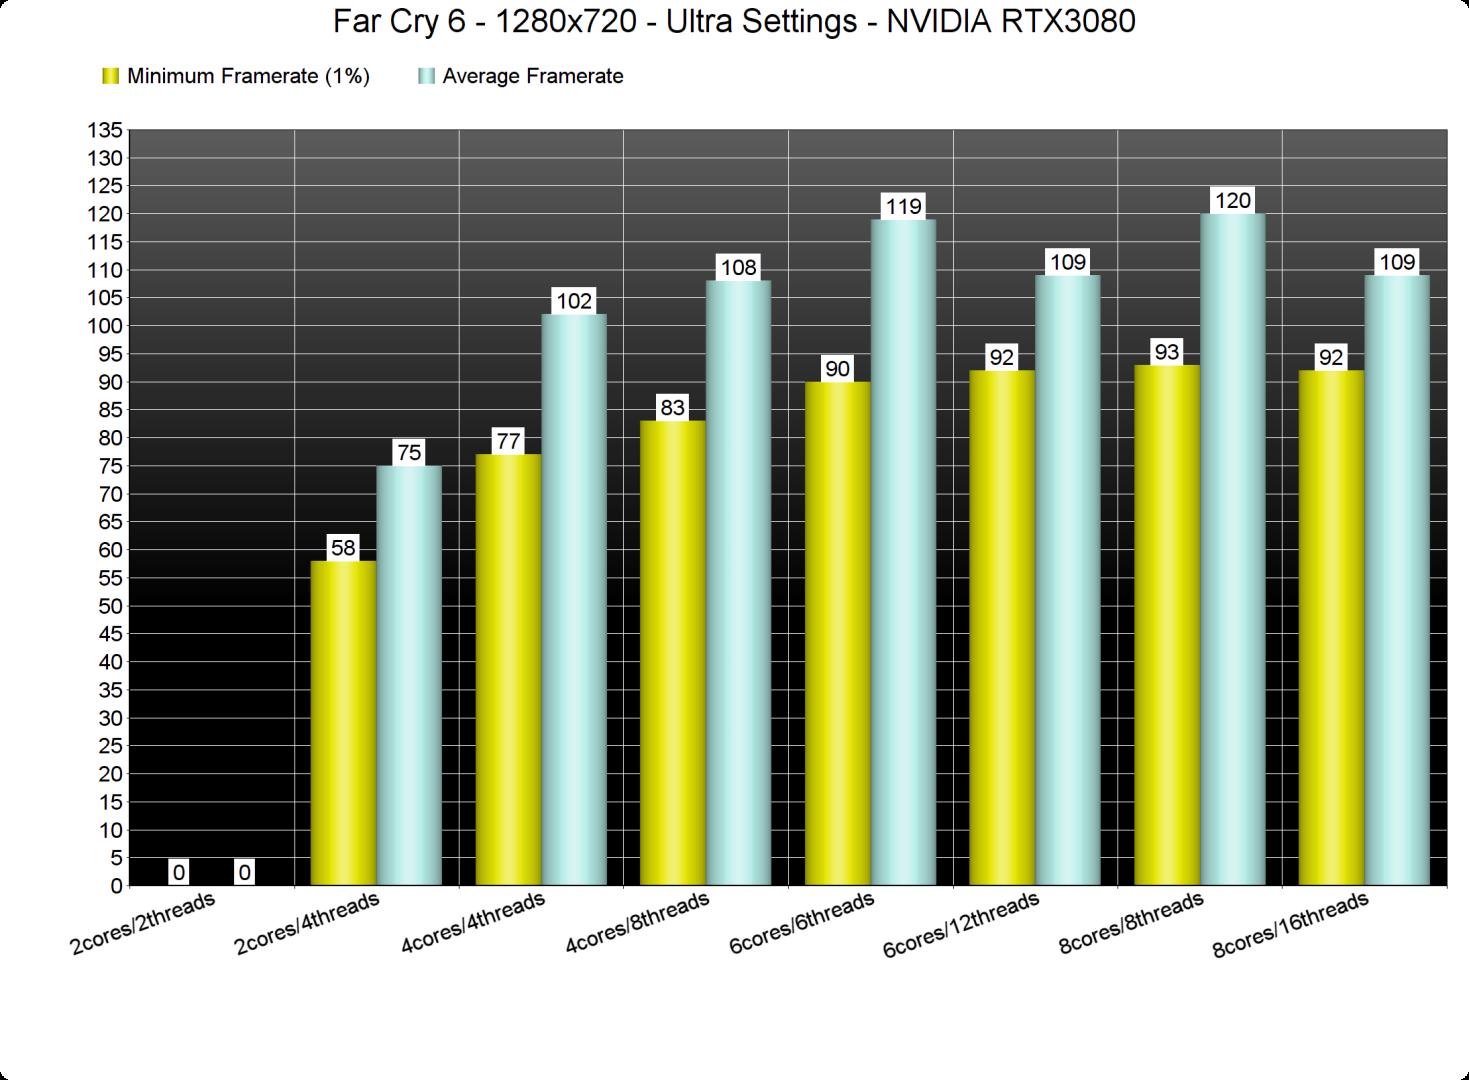 Far Cry 6 CPU benchmarks